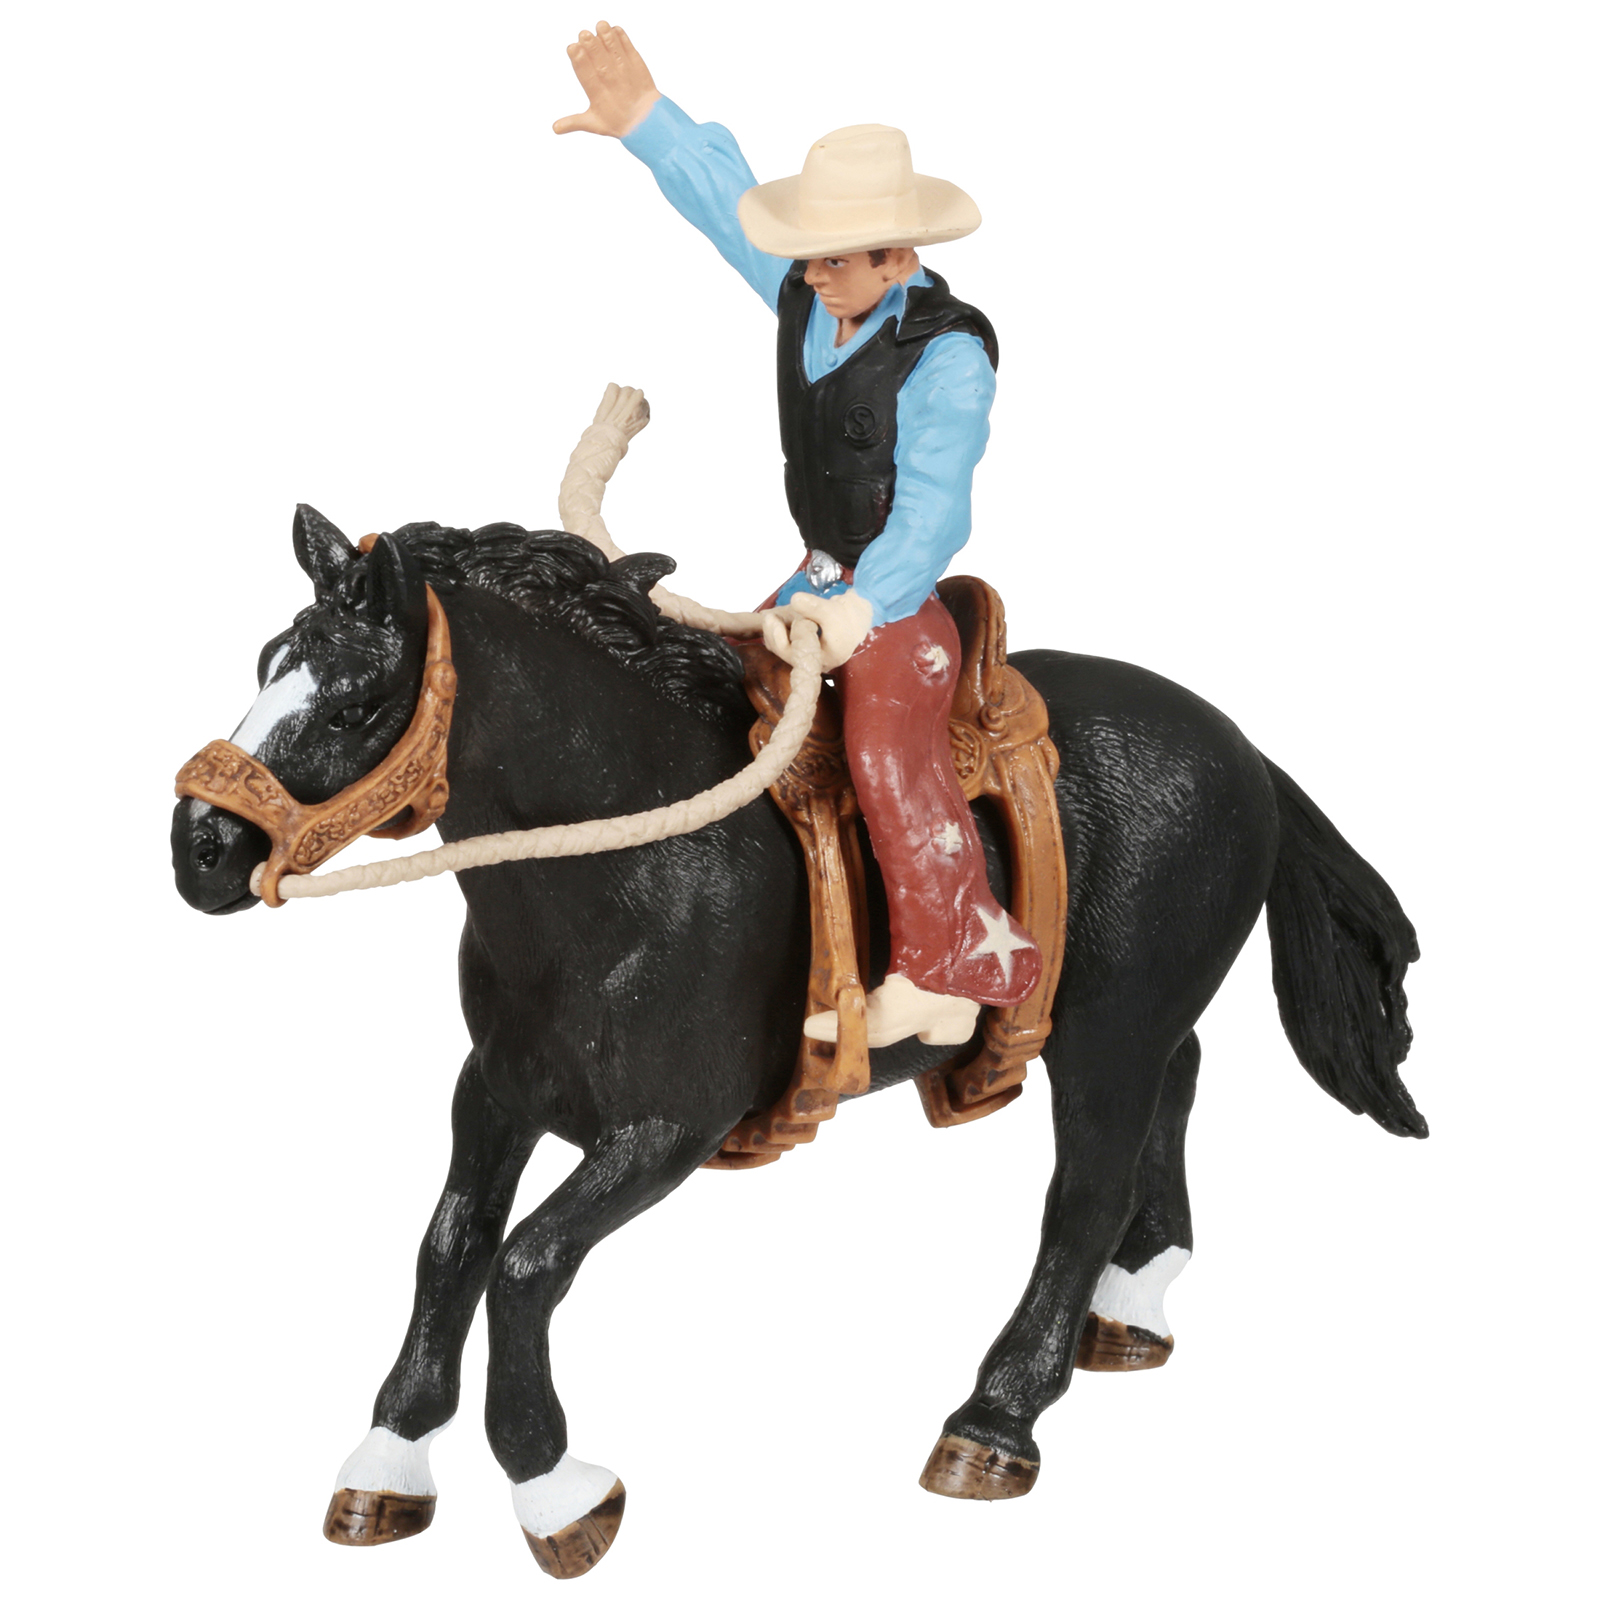 Schleich Farm World Rodeo Series Horse And Rider Toy Figure Walmart Com Walmart Com